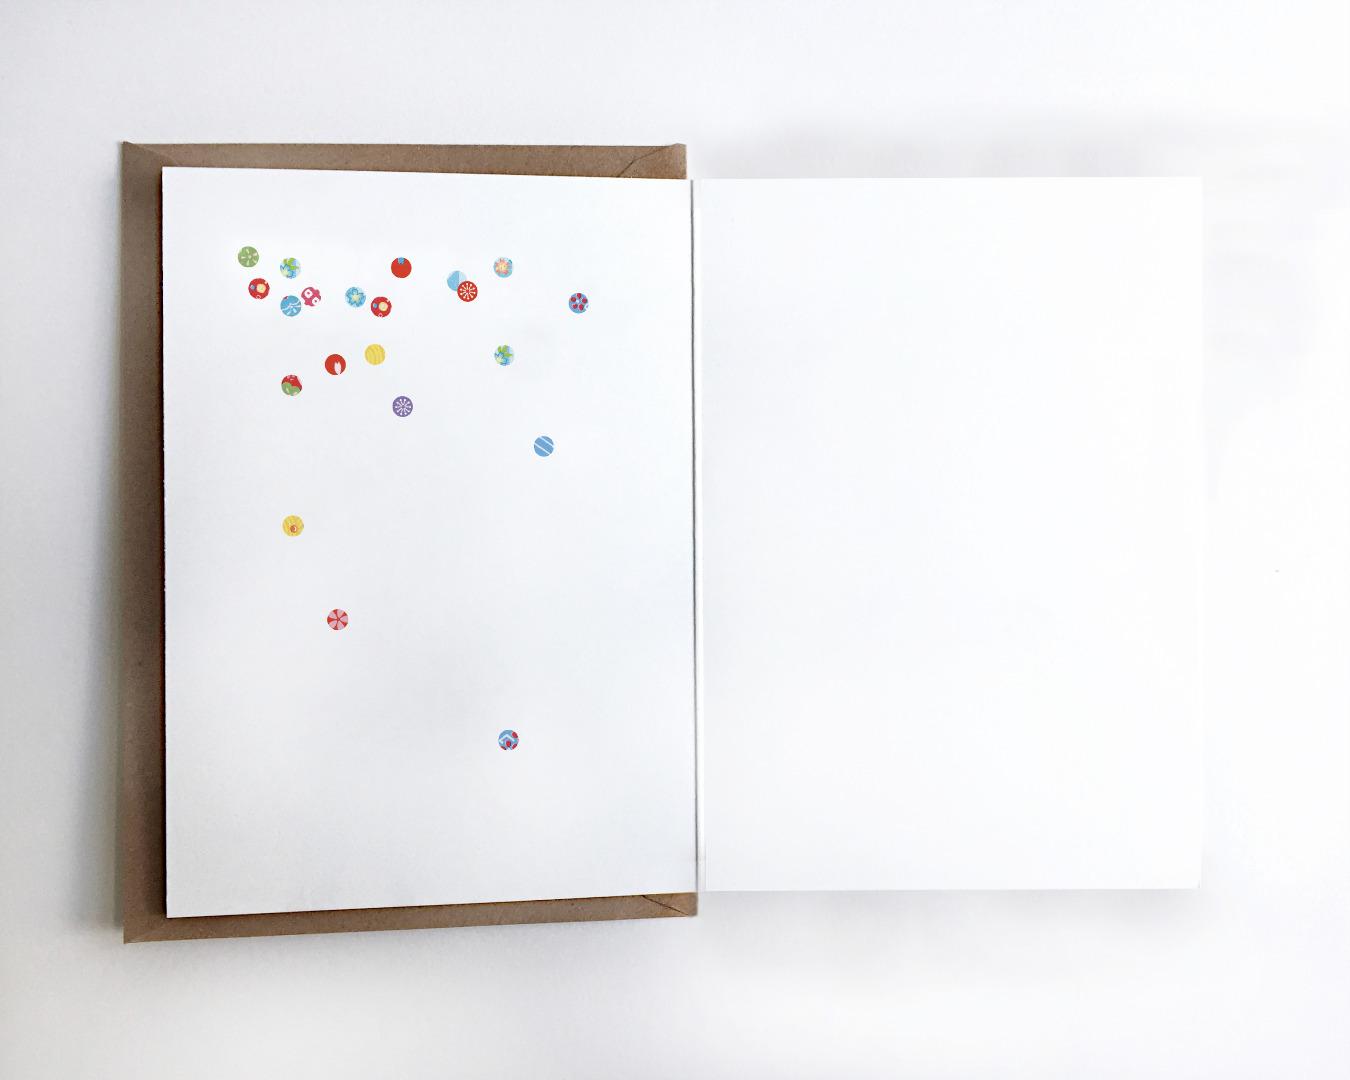 Grusskarte Partyesel Geburtstagskarte